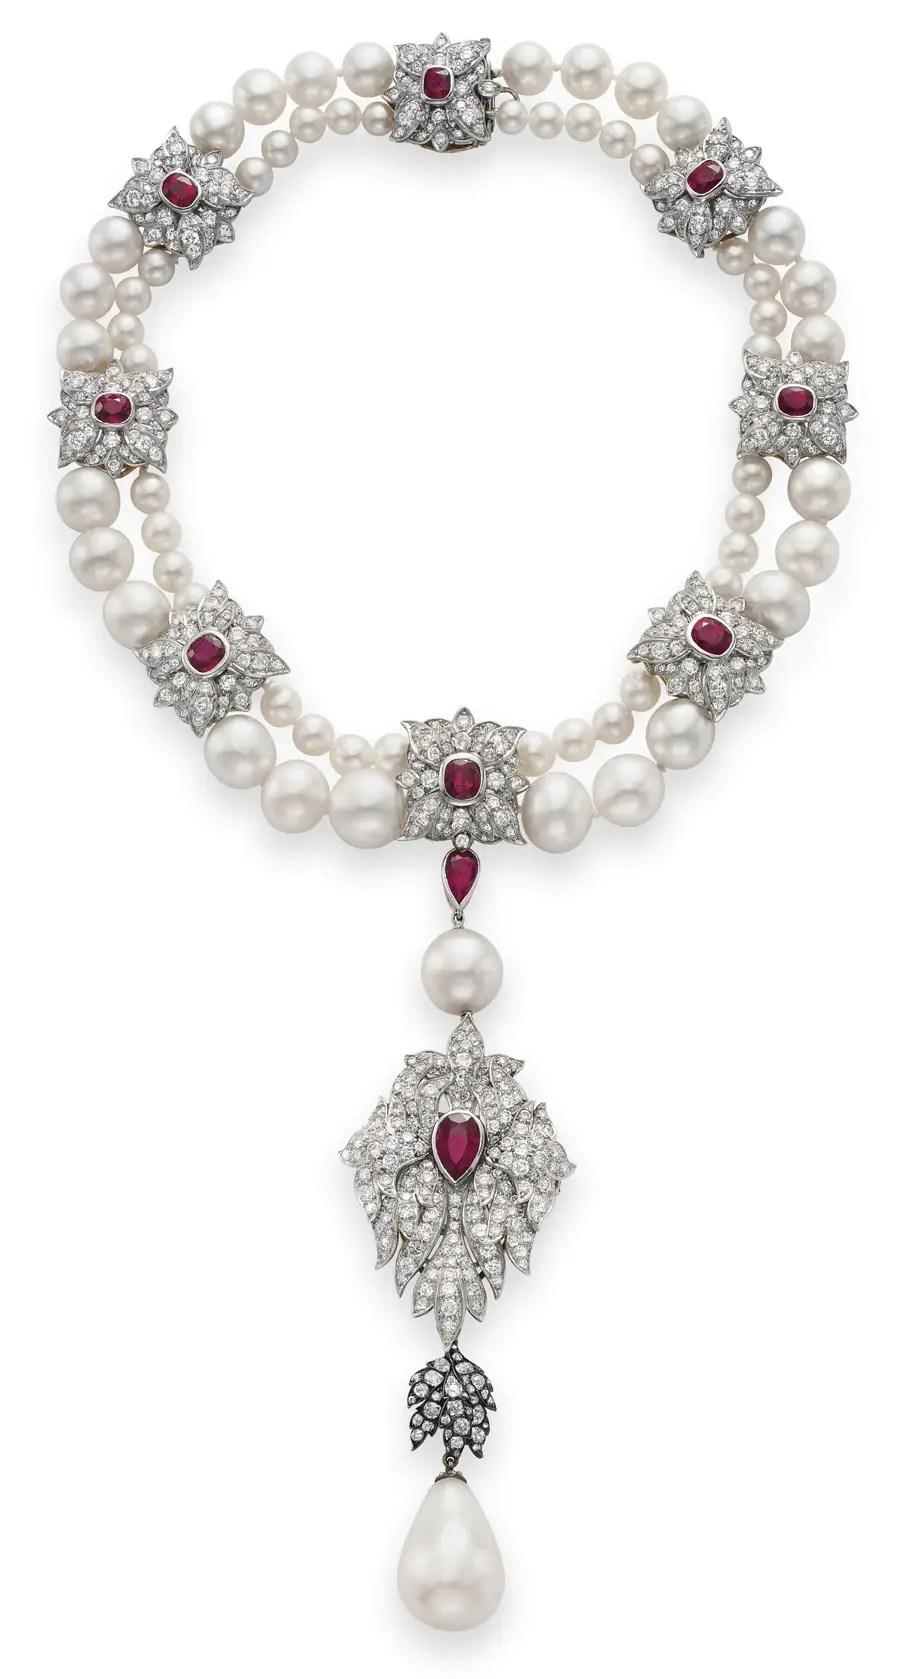 Elizabeth Taylor Jewelry Auction : elizabeth, taylor, jewelry, auction, Insider